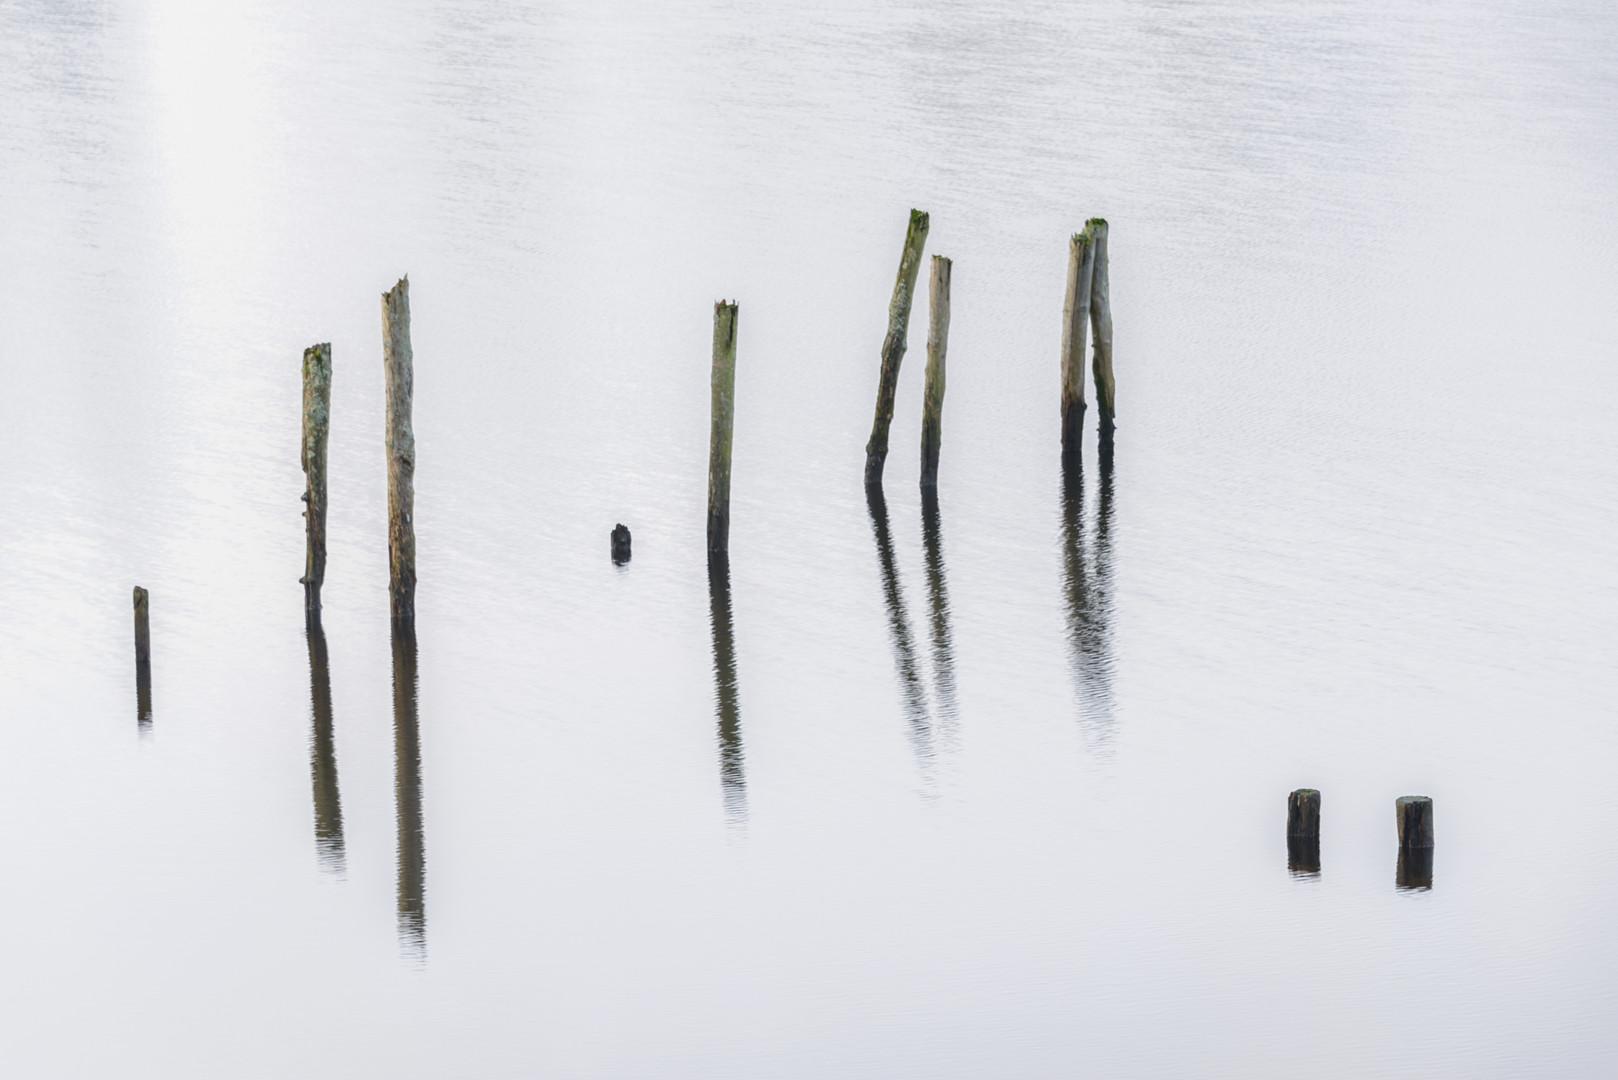 Old mooring posts